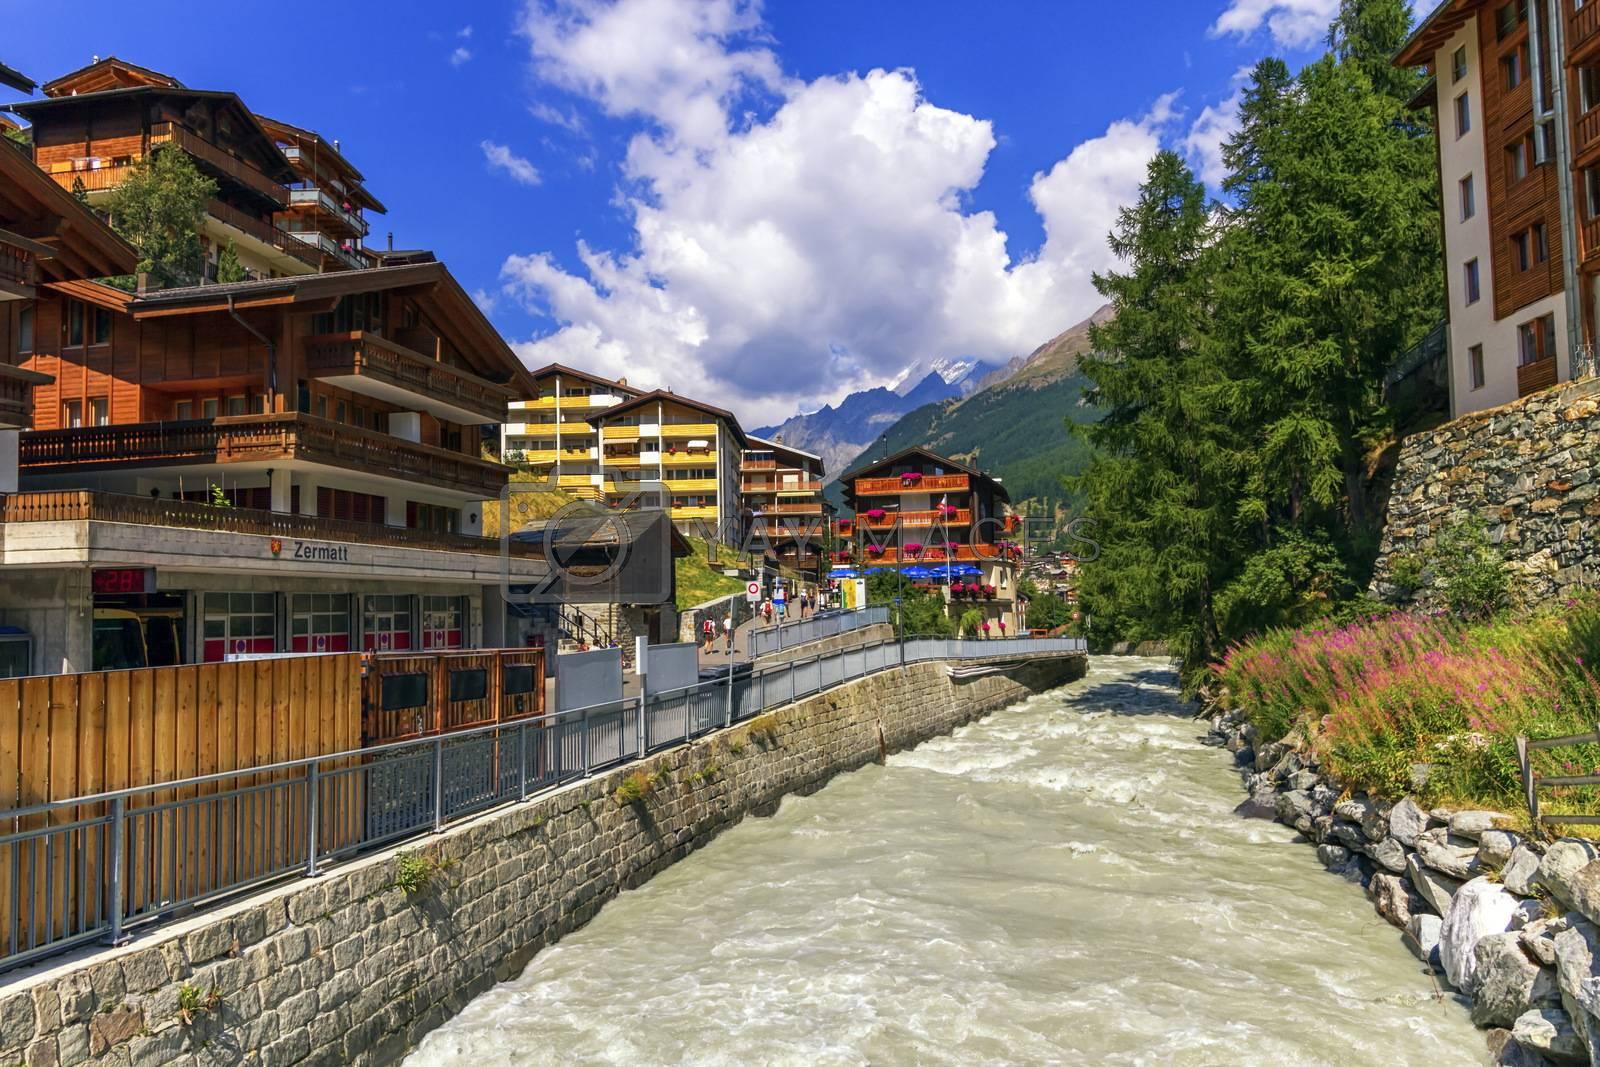 Matter Vispa river in Zermatt by day, Zermatt, Switzerland